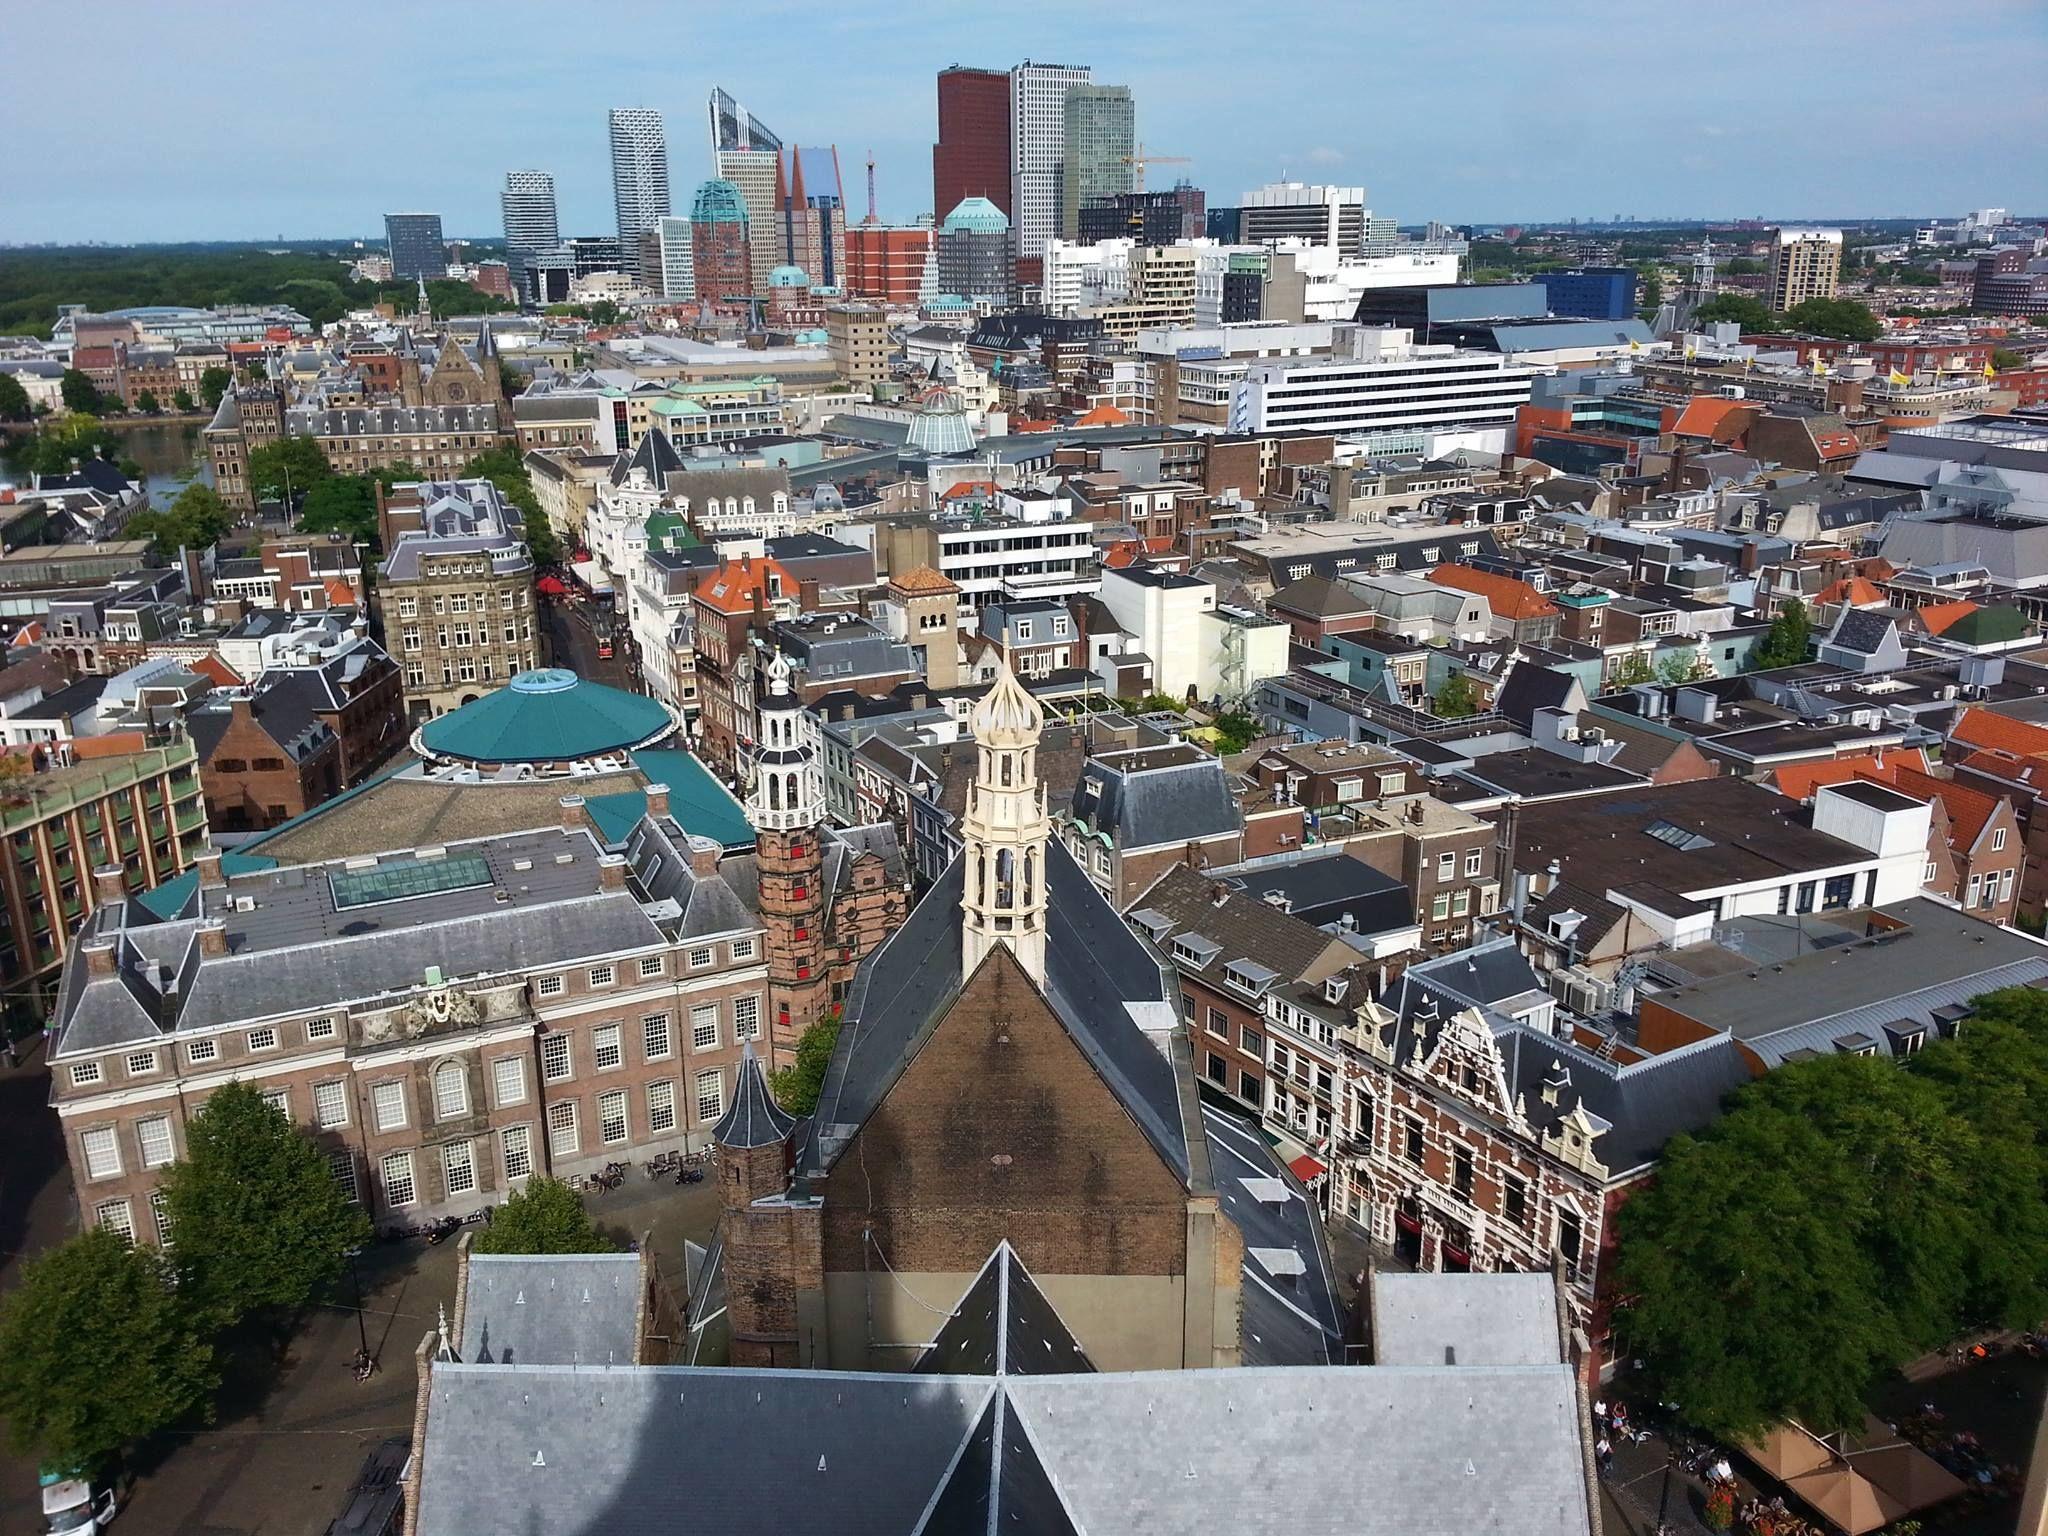 Den Haag (The Hague) The Netherlands [2048x1536